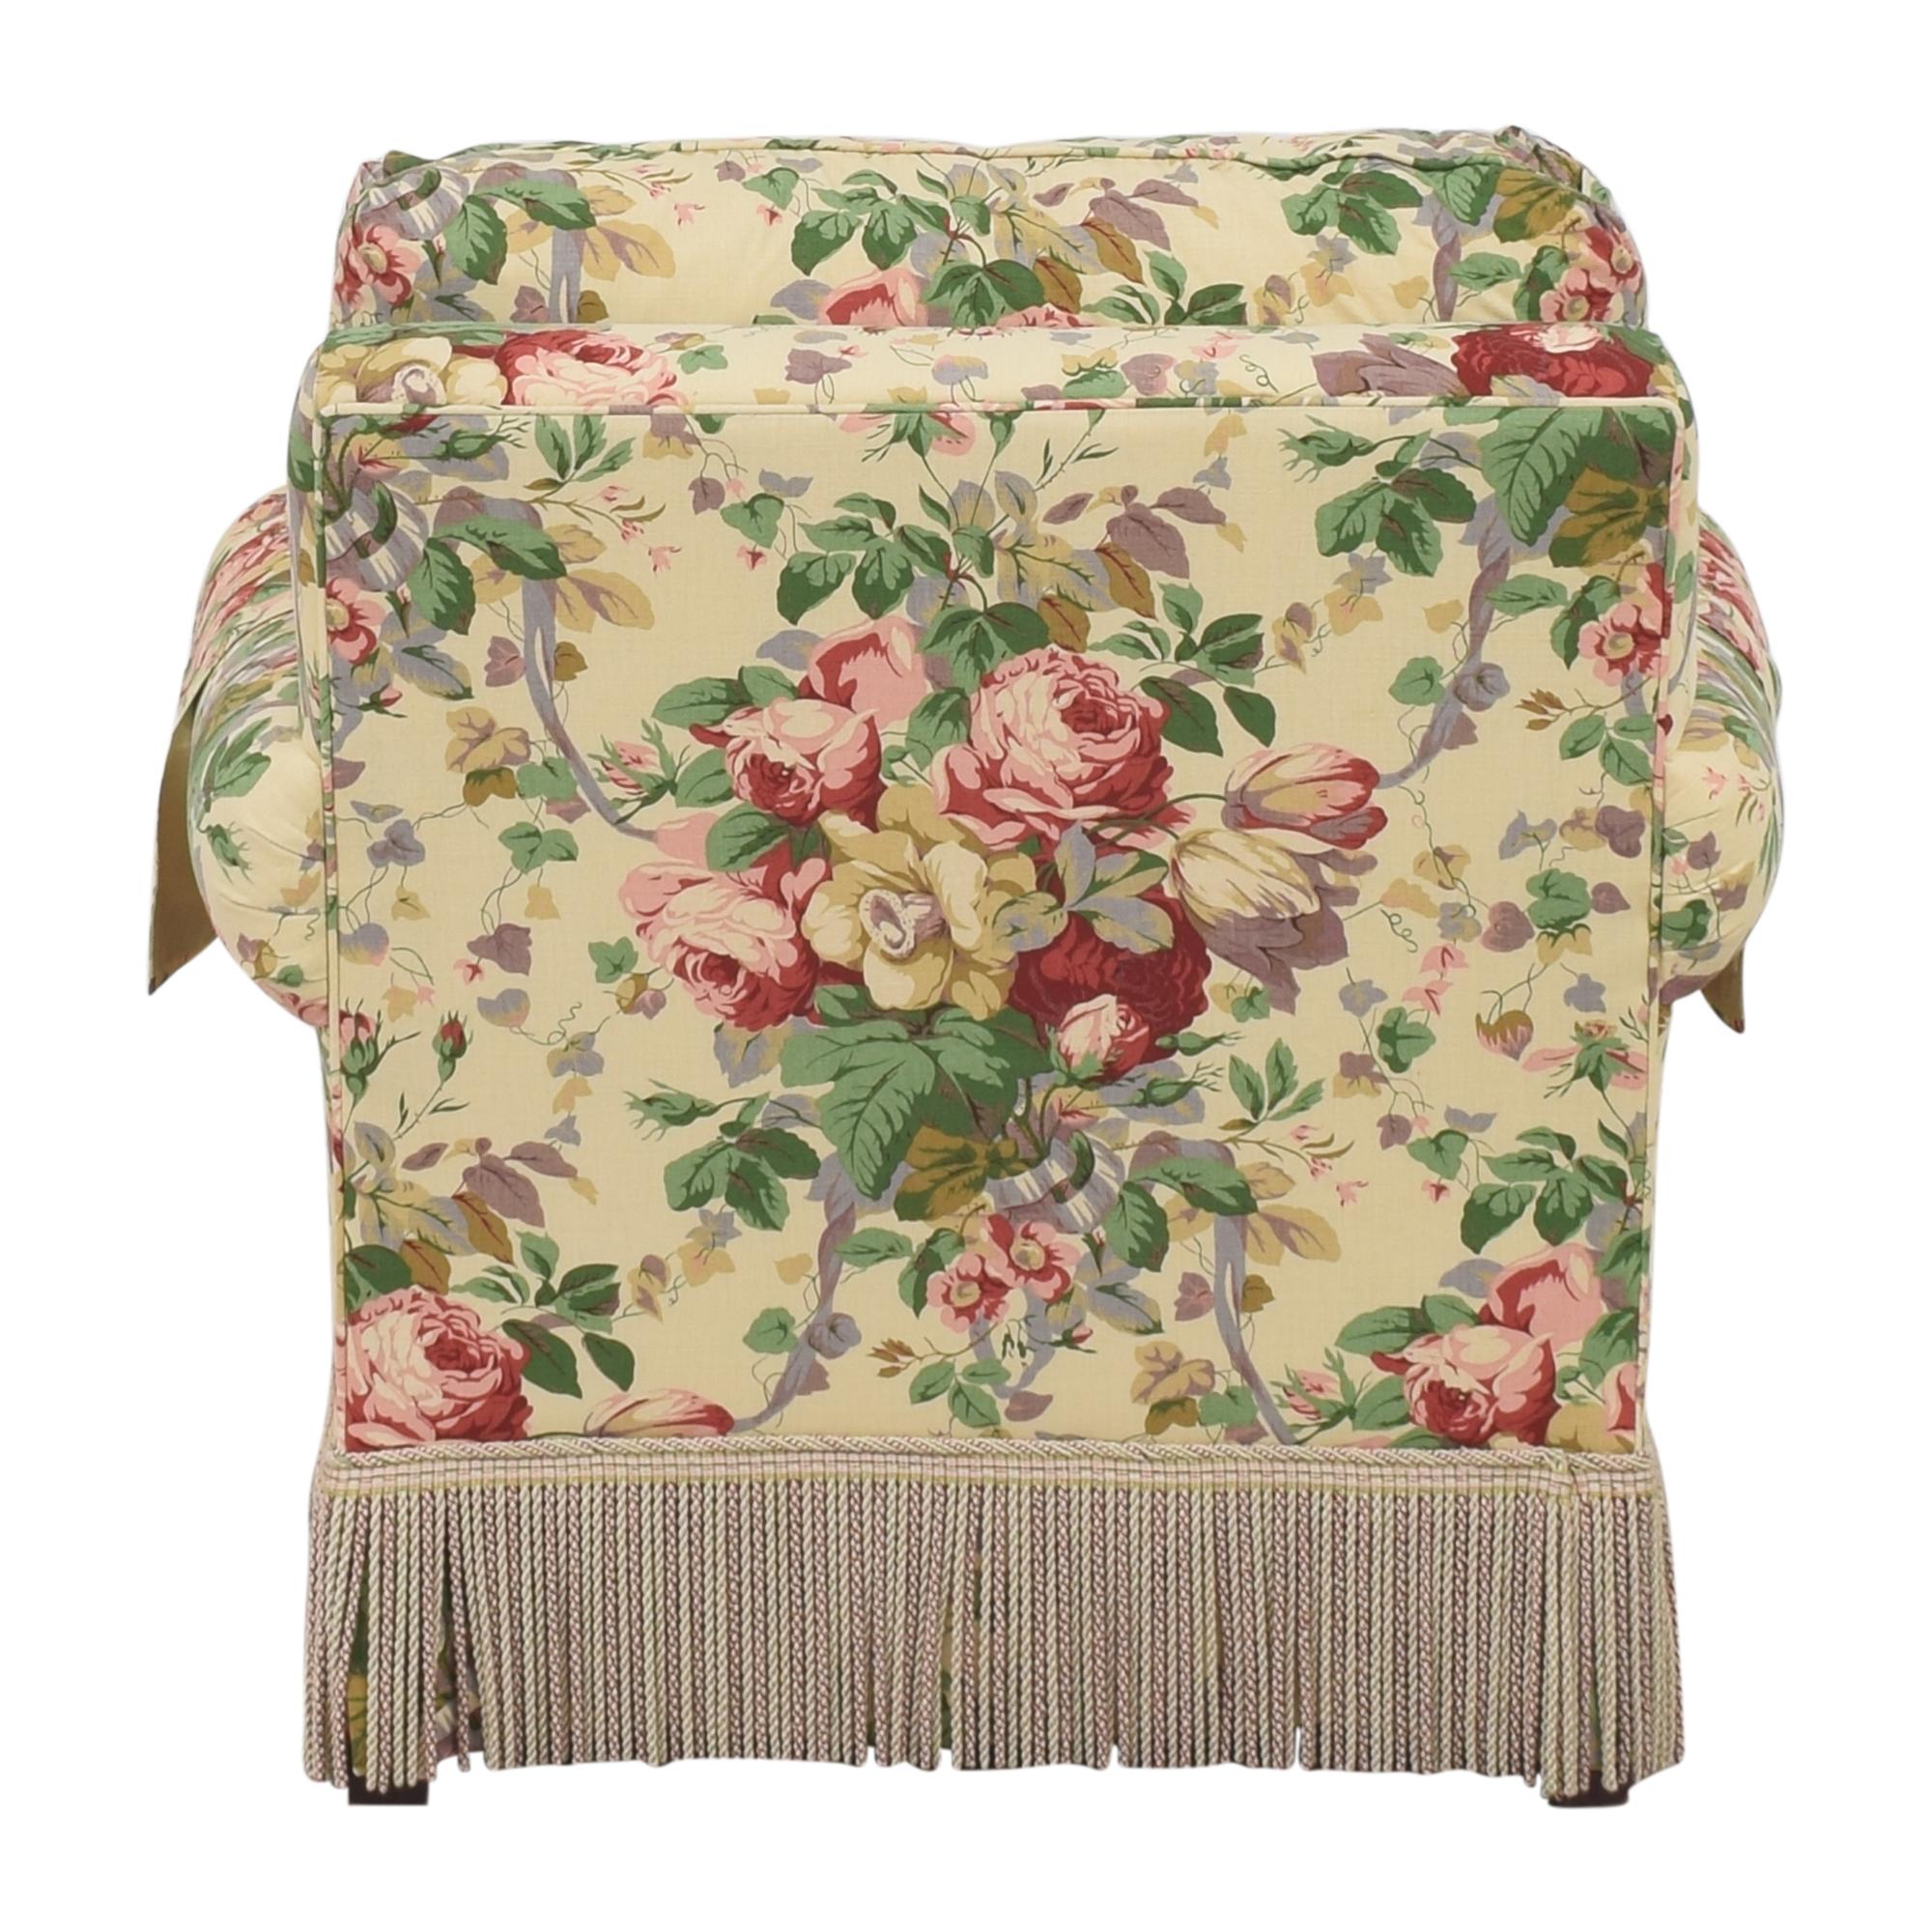 Lee Jofa Lee Jofa Floral Club Chair Accent Chairs